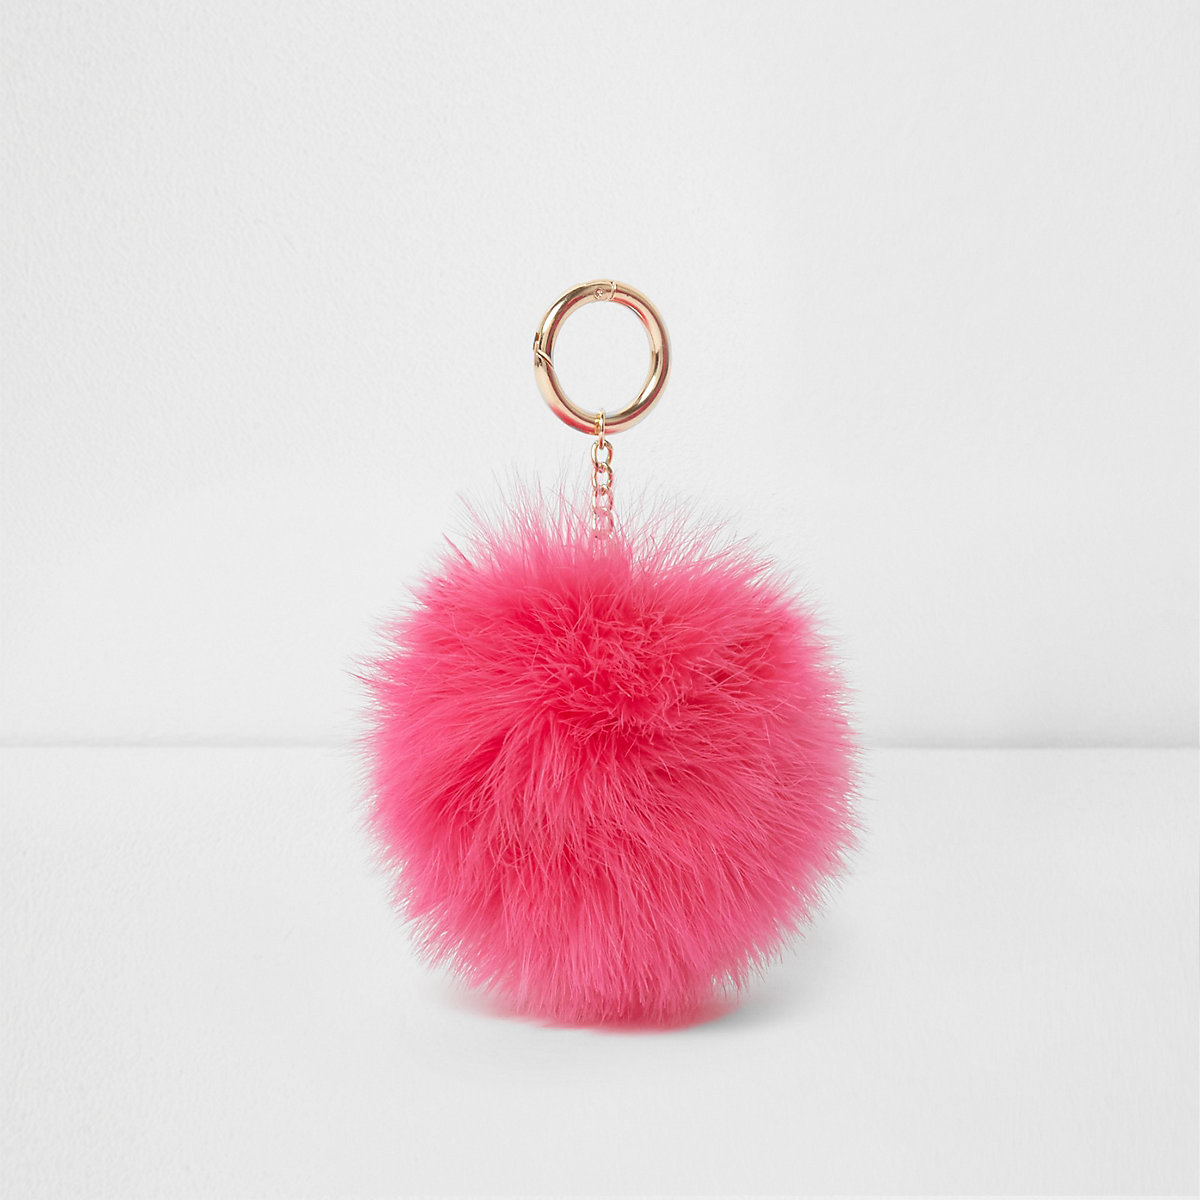 Pink feather pom pom keyring